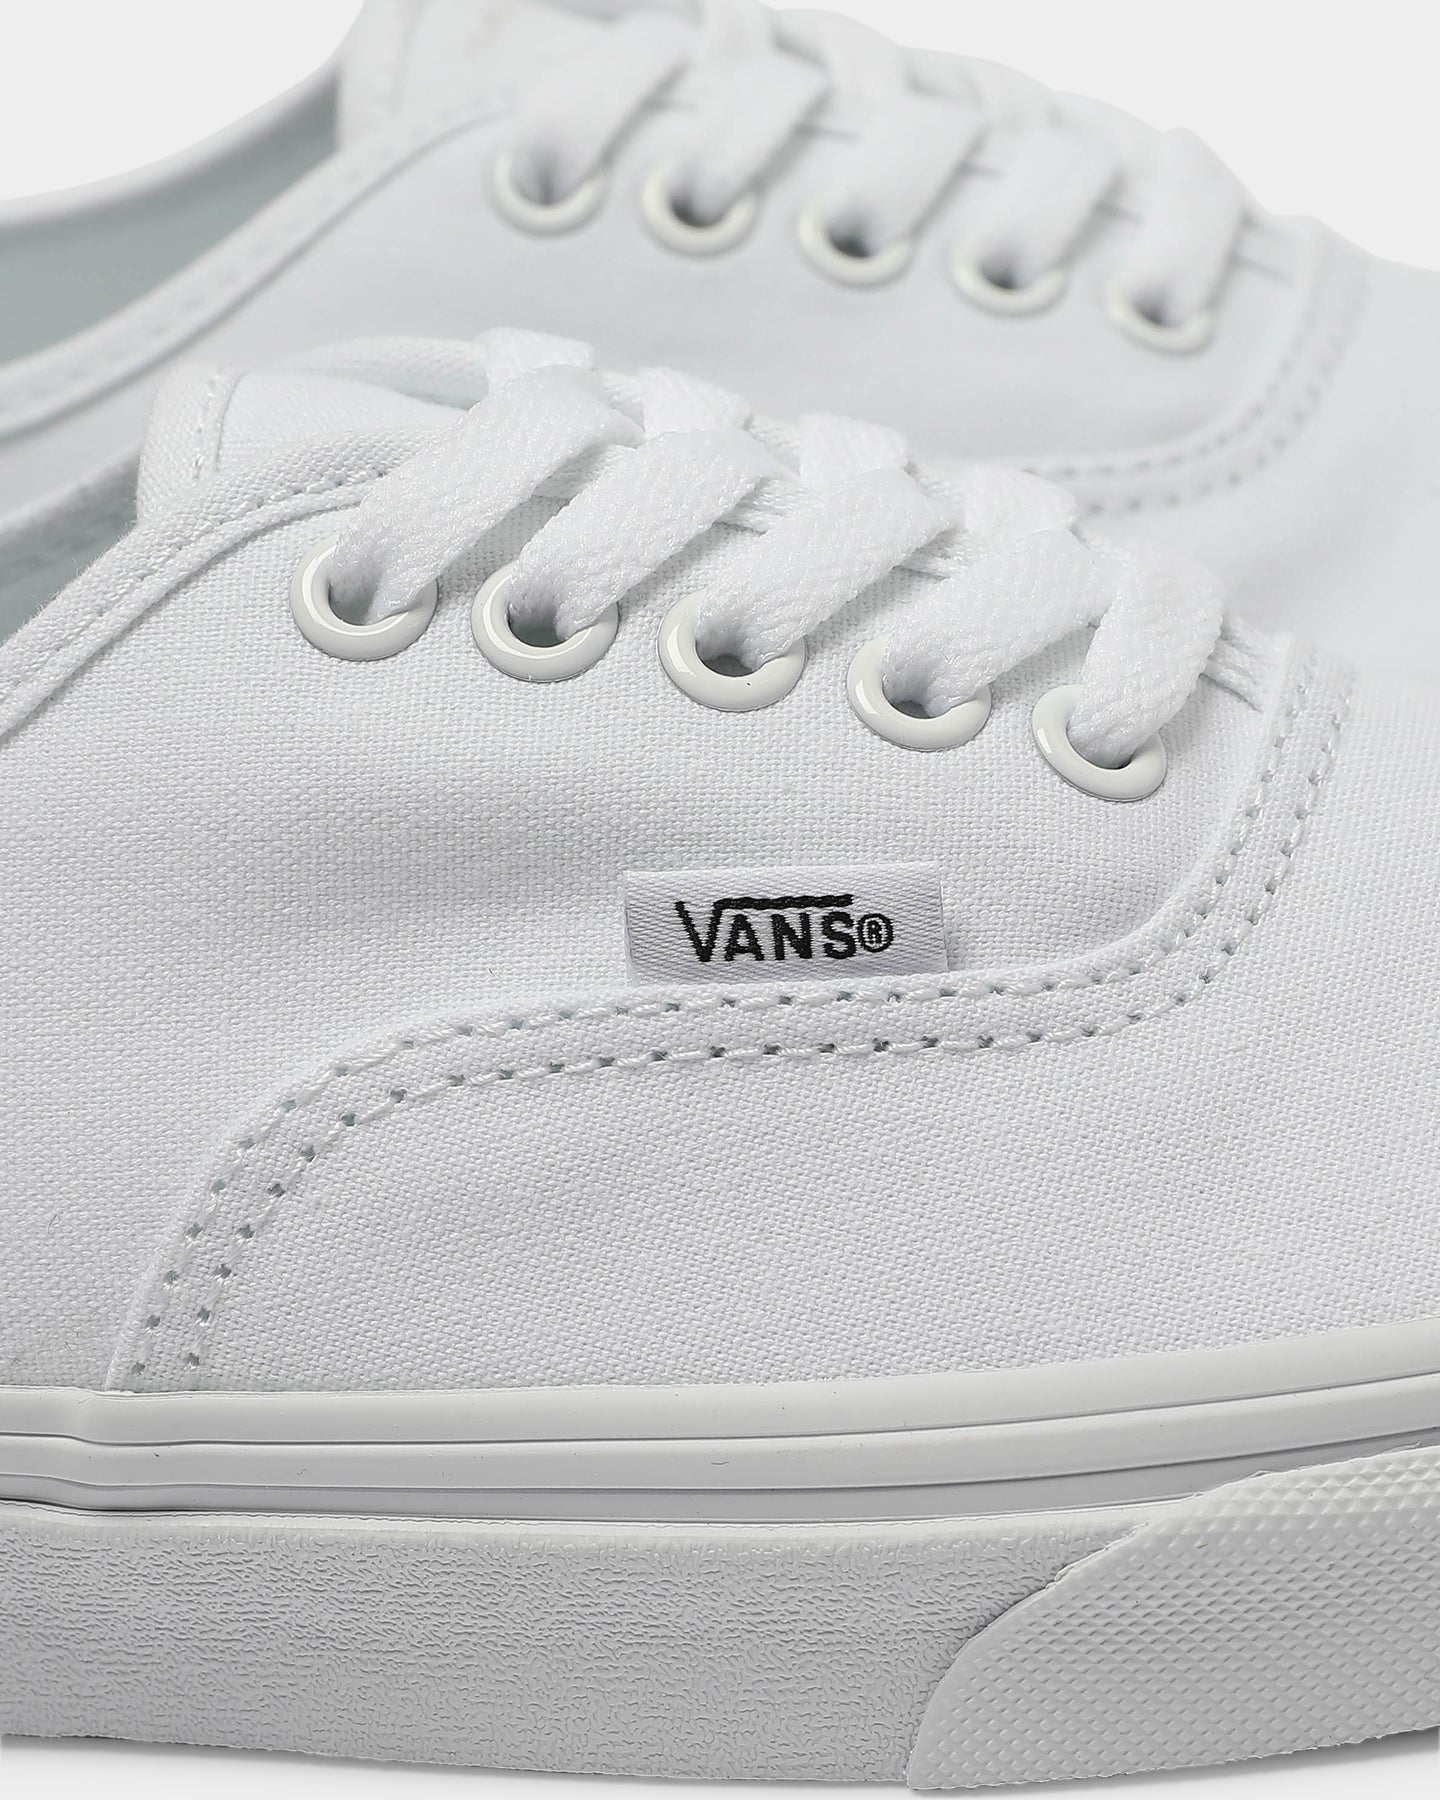 VANS AUTHENTIC WHITEWHITE